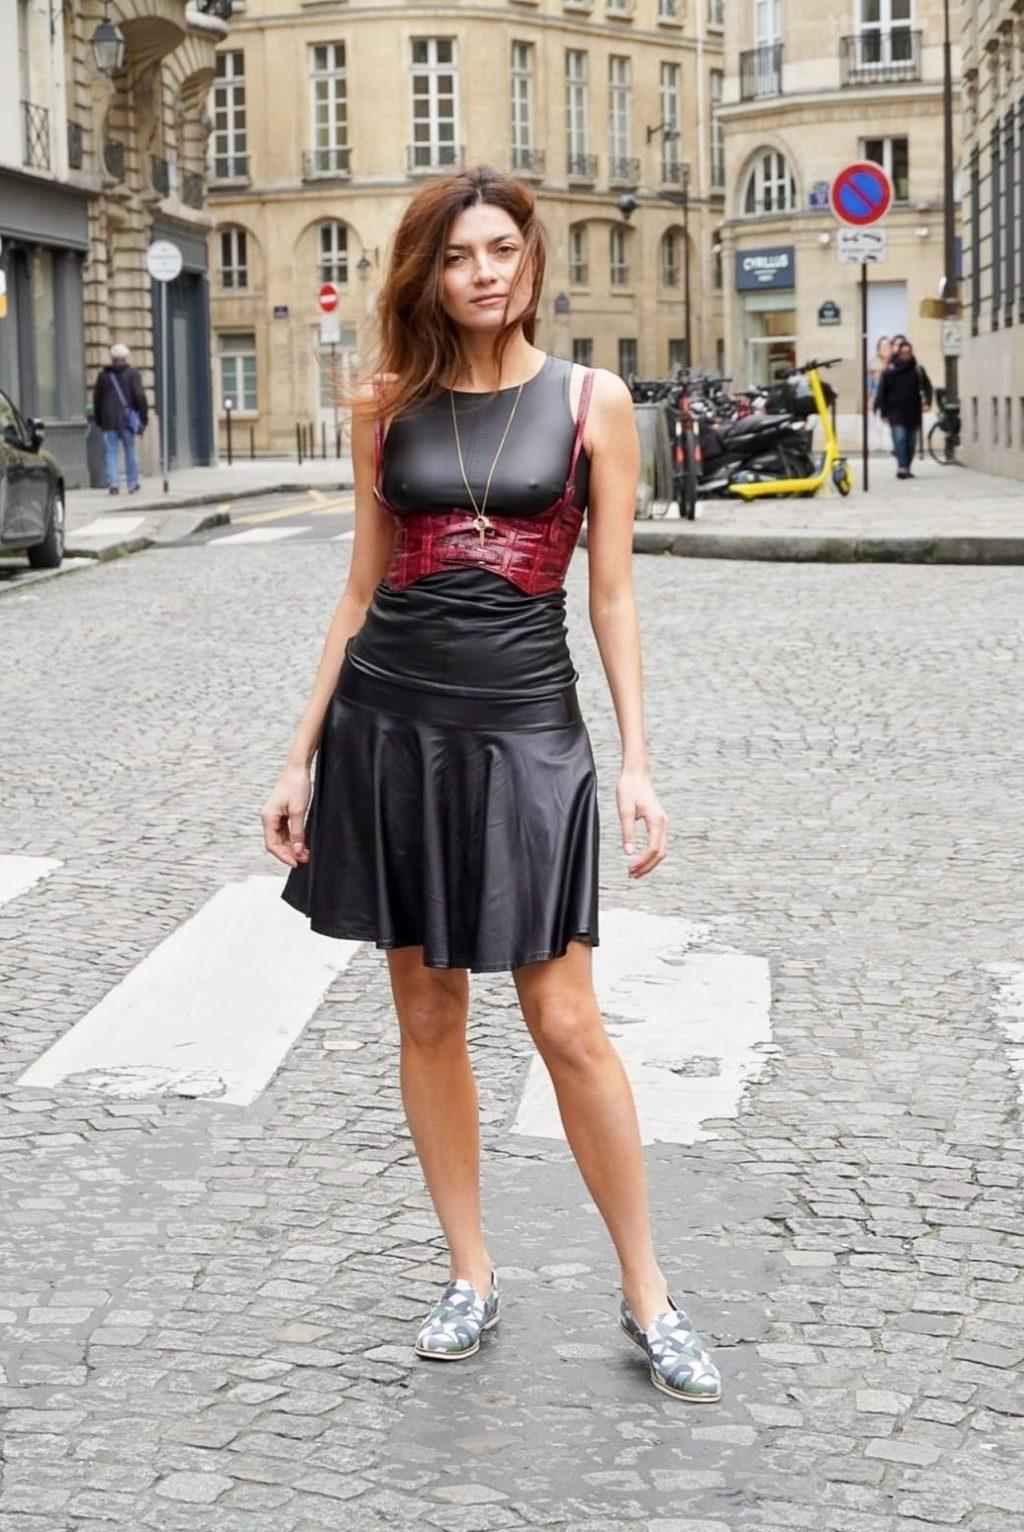 Blanca Blanco Poses For Photos While Out in Paris (12 Photos)